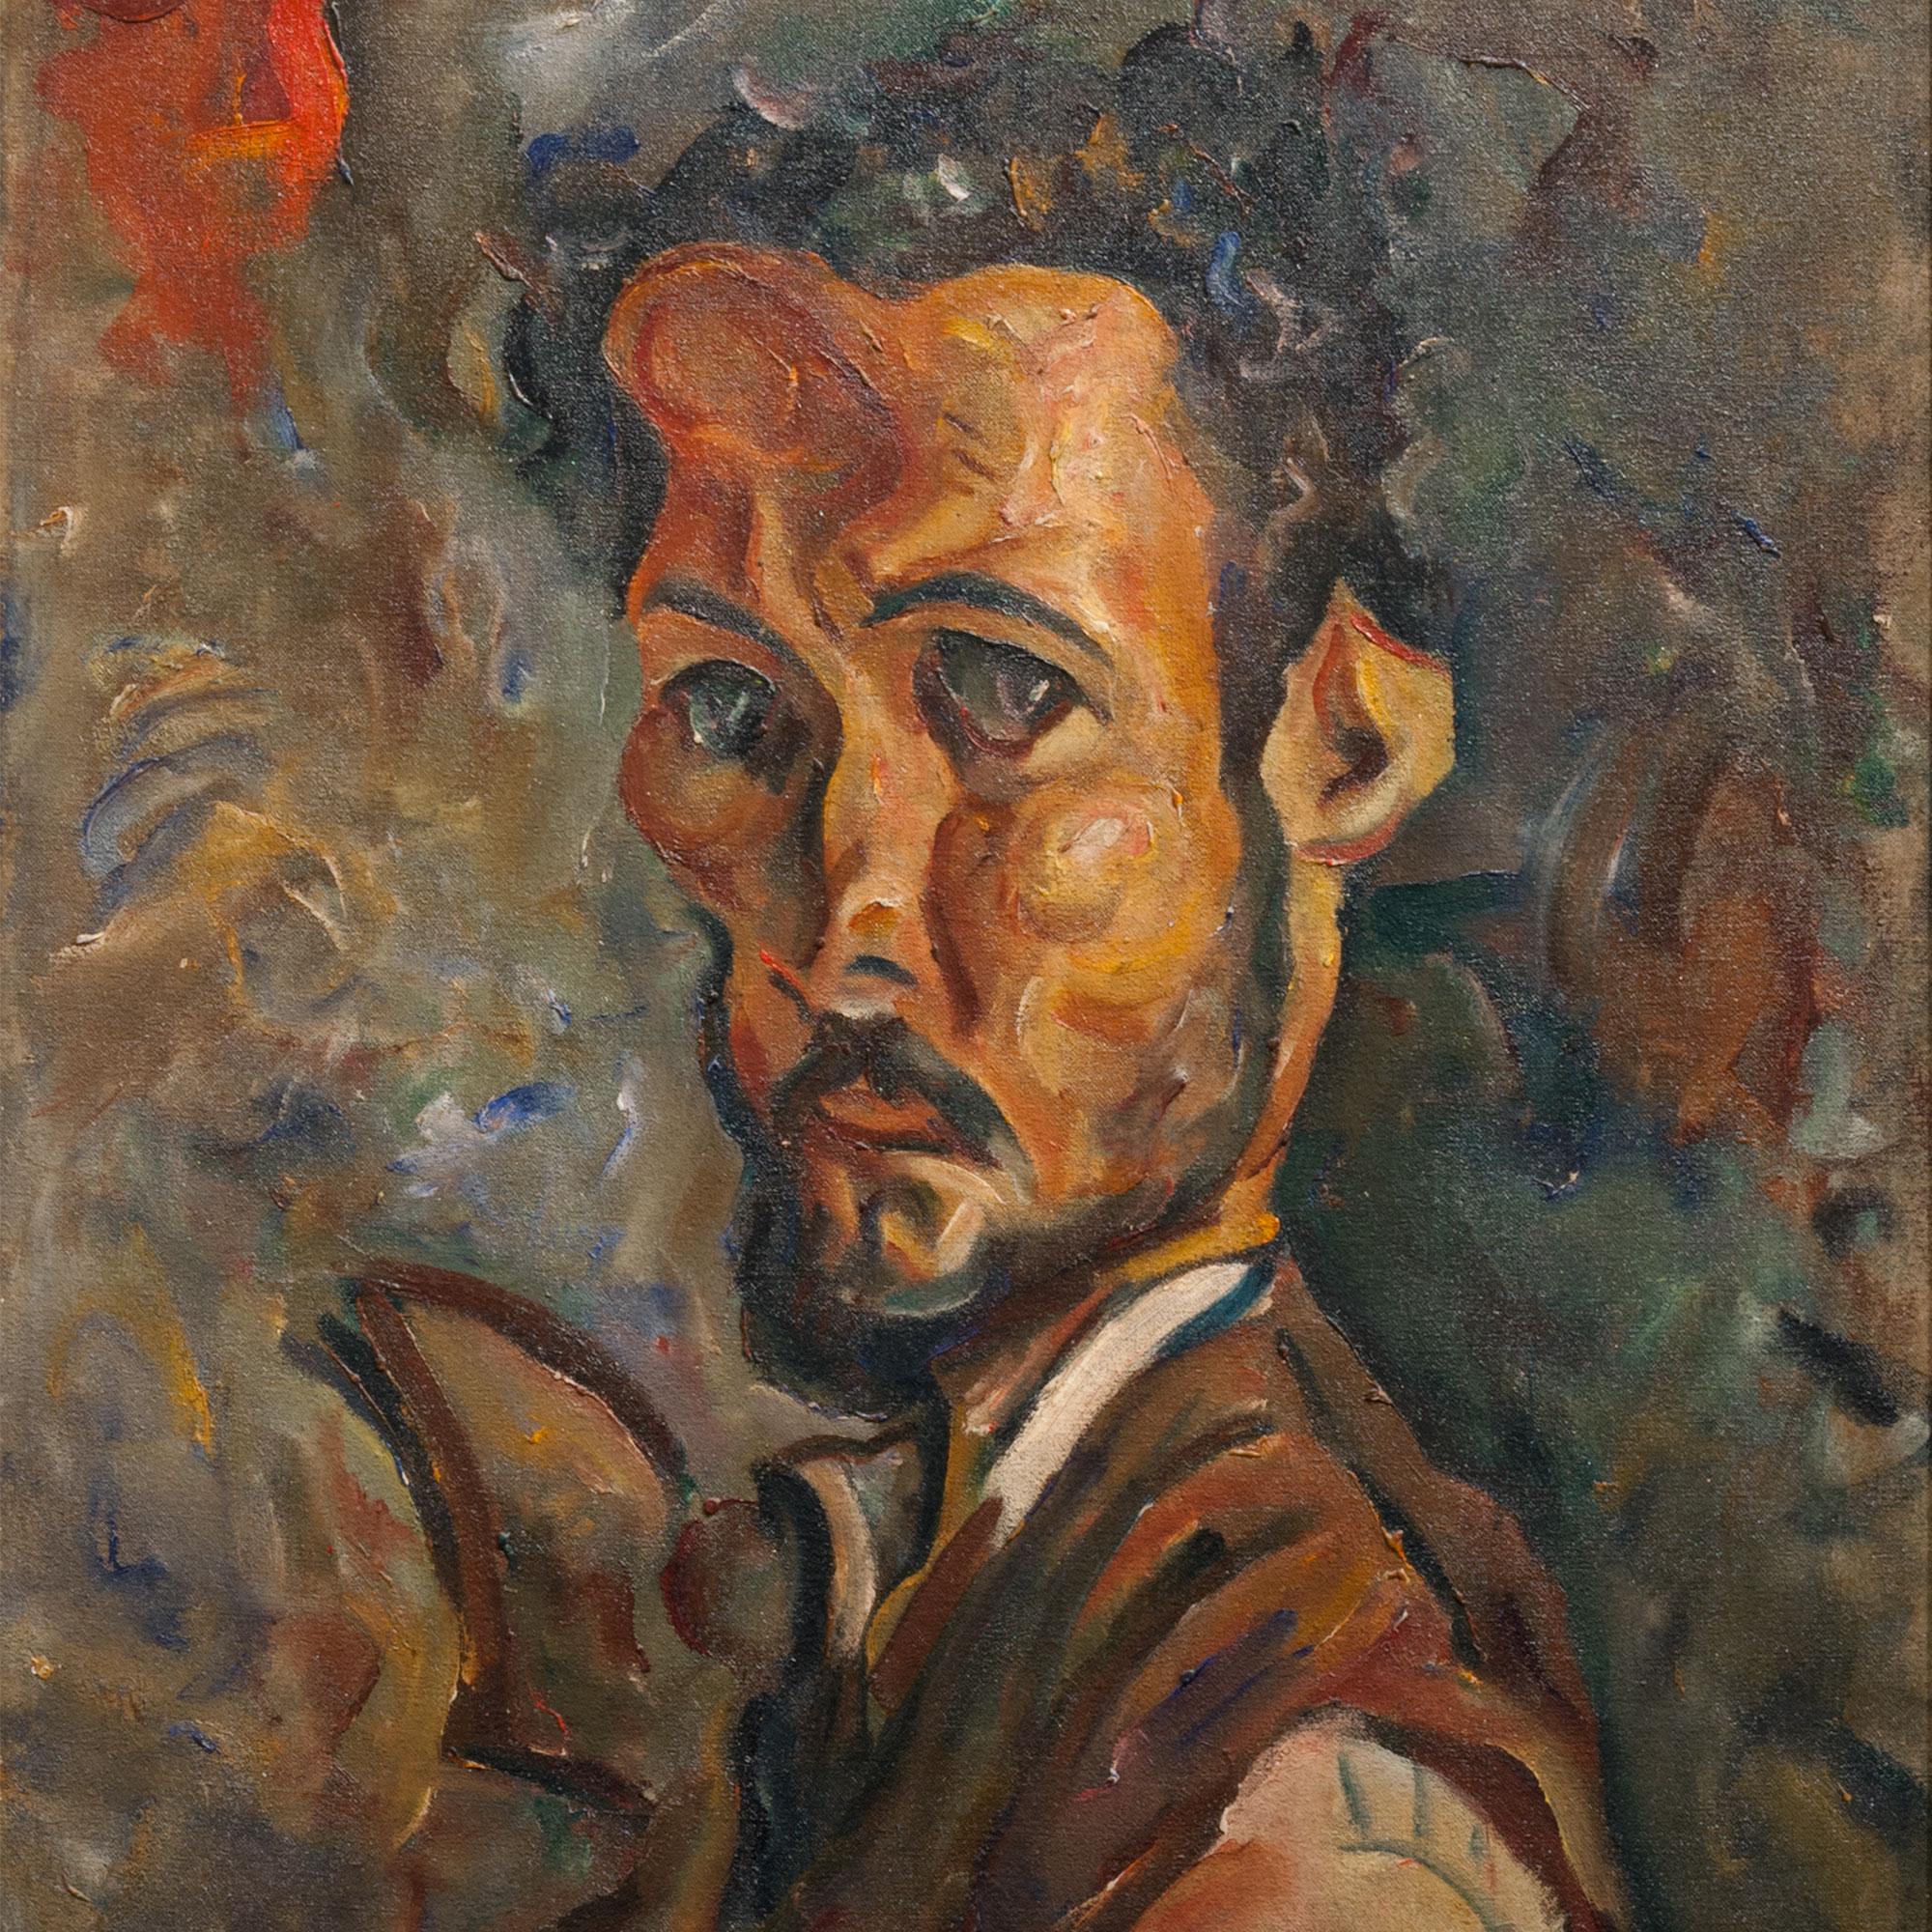 William H. Johnson Self Portrait